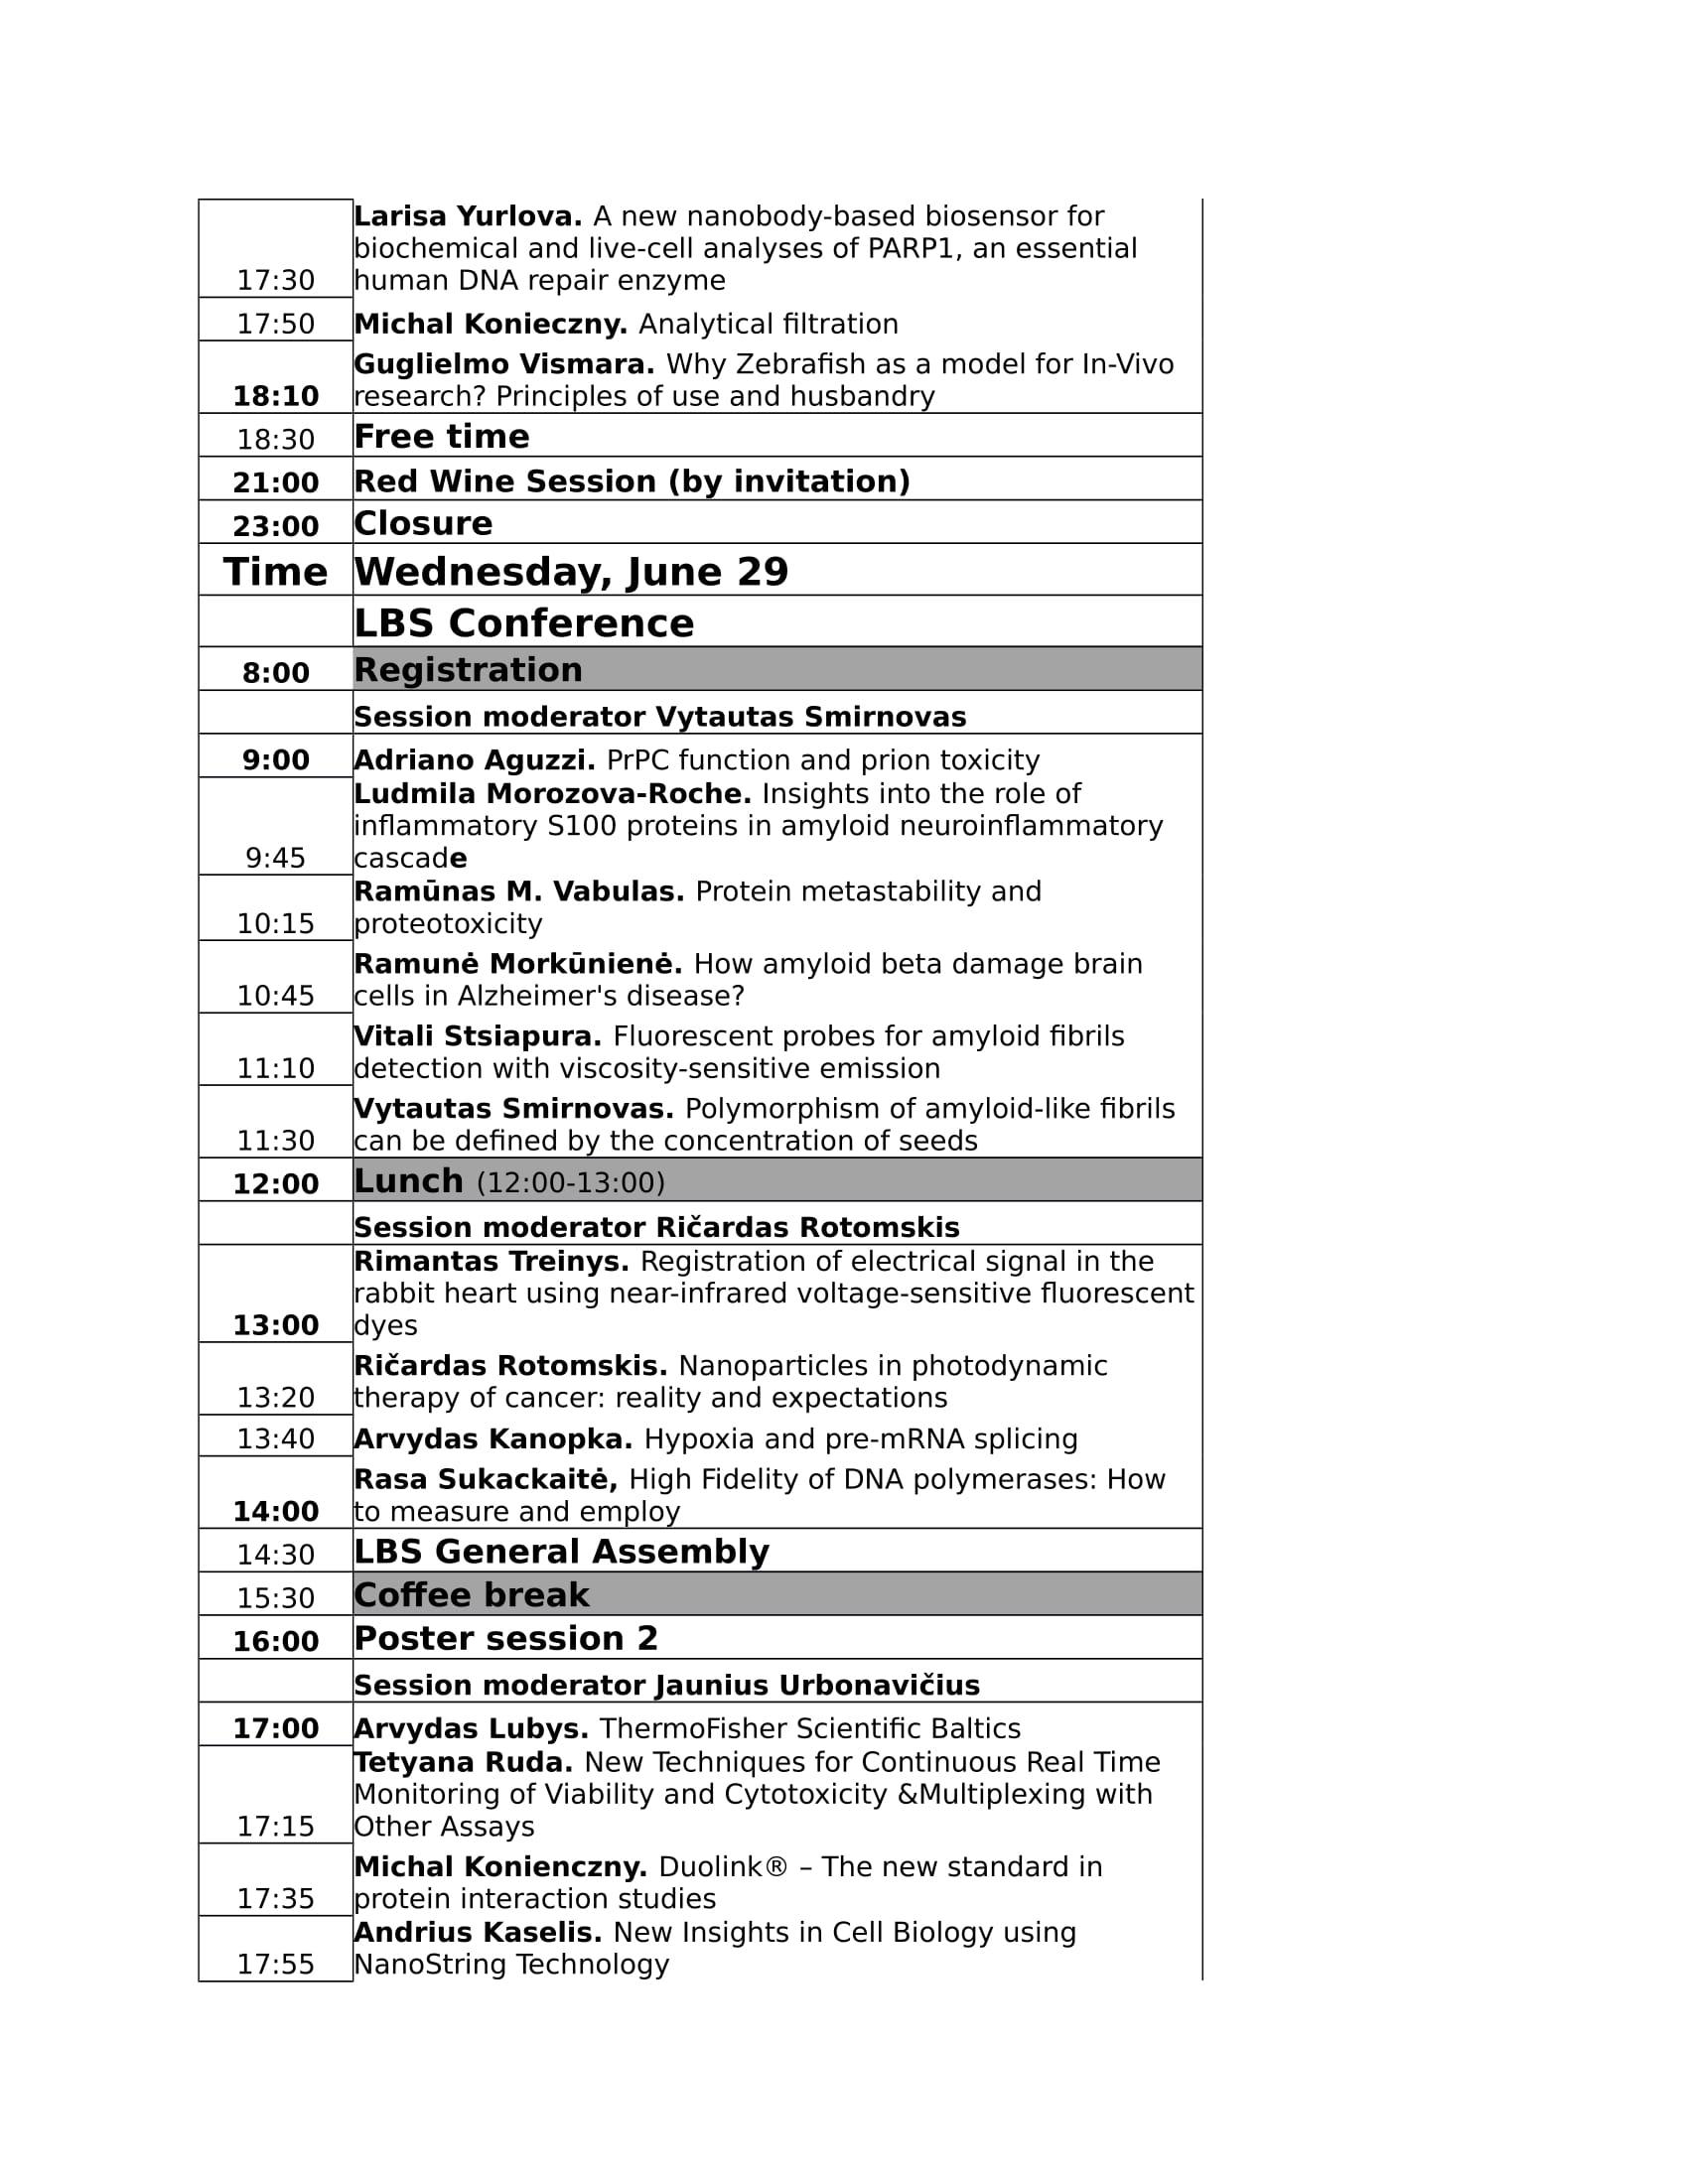 titles of presentations lbd program titles lbs 2016 1 program titles lbs 2016 2 program titles lbs 2016 3